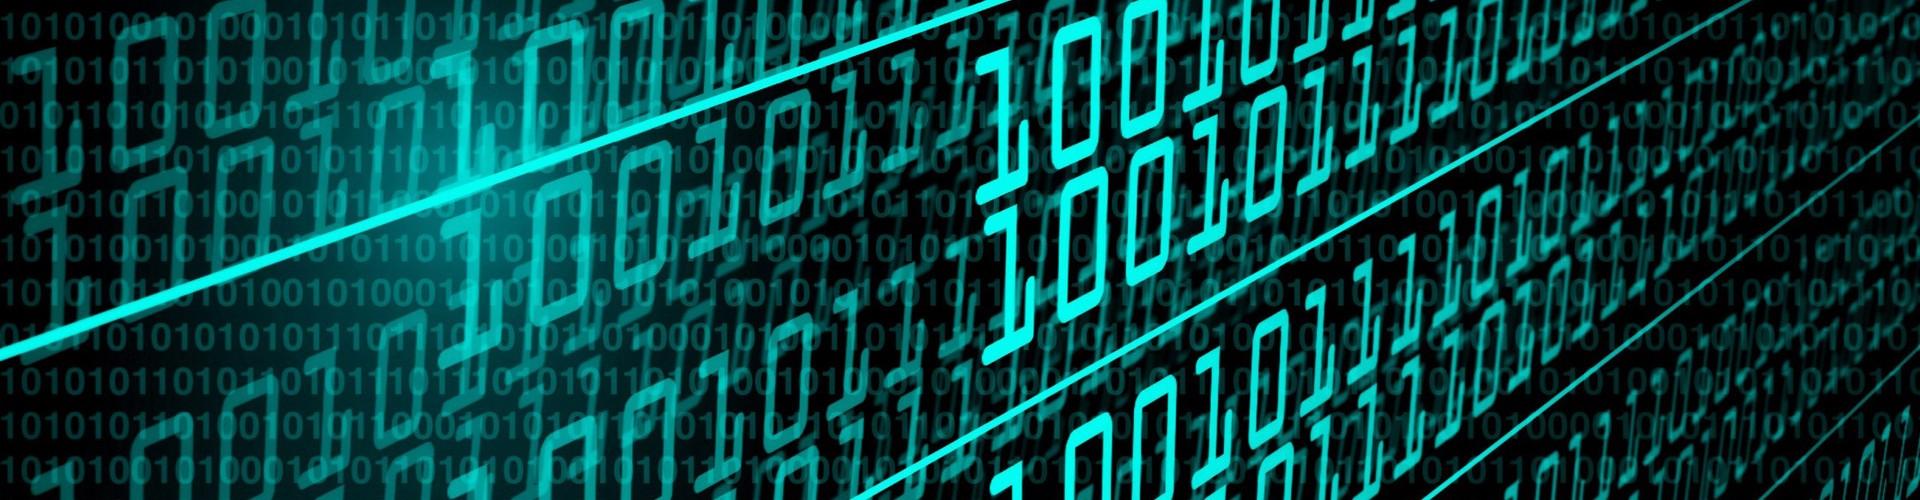 binary-code-9004-1920x1080